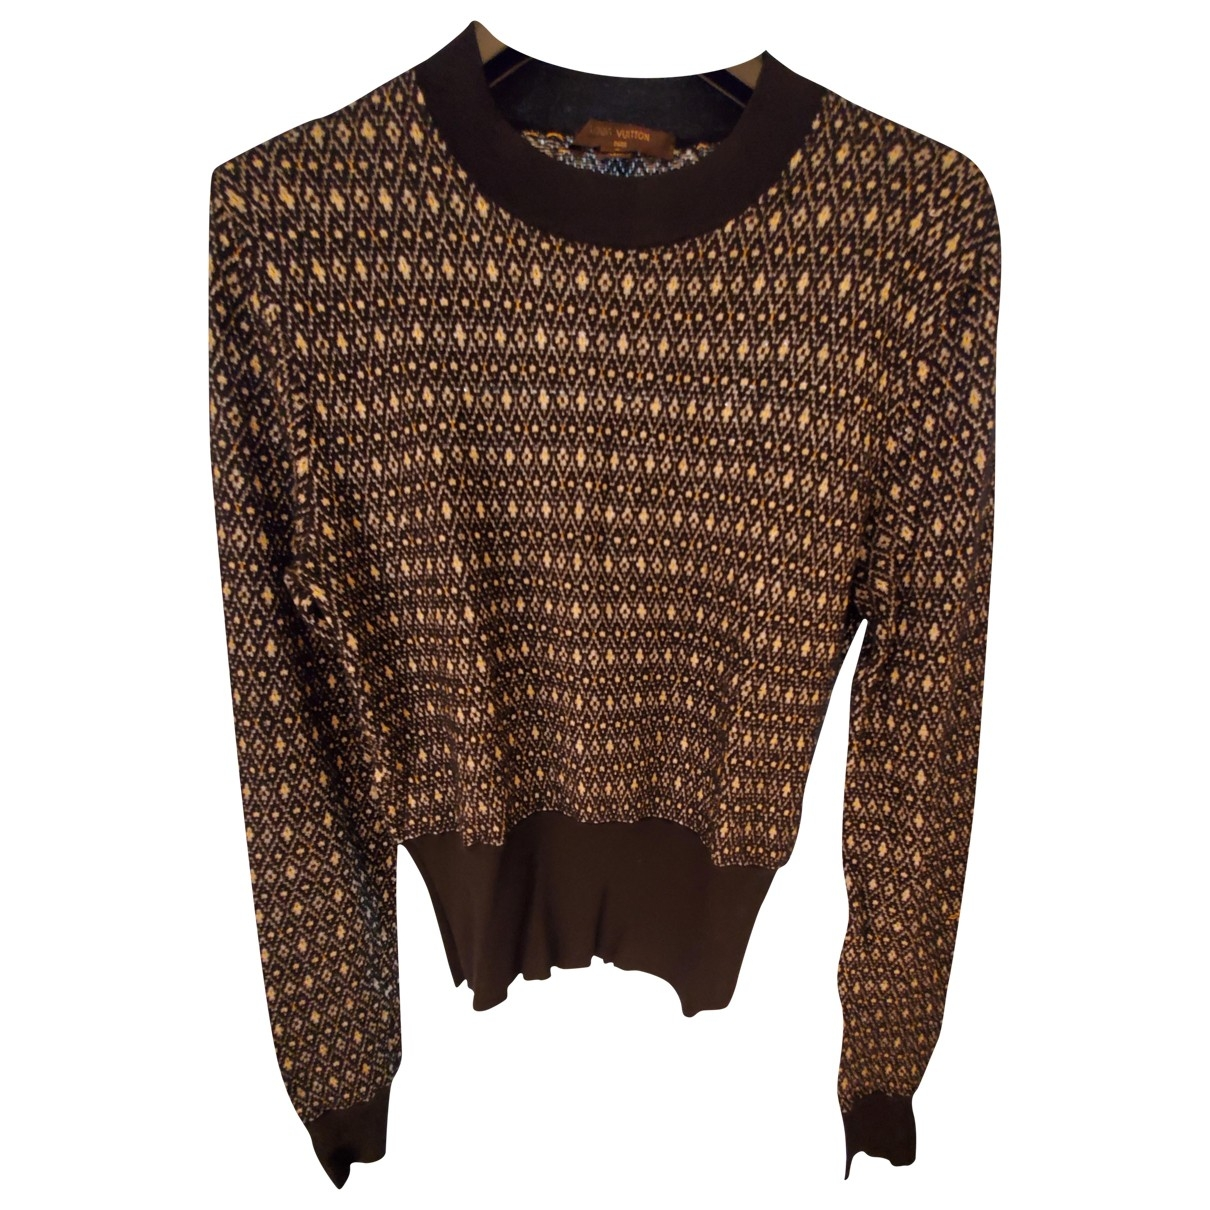 Louis Vuitton \N Multicolour Cashmere Knitwear for Women S International